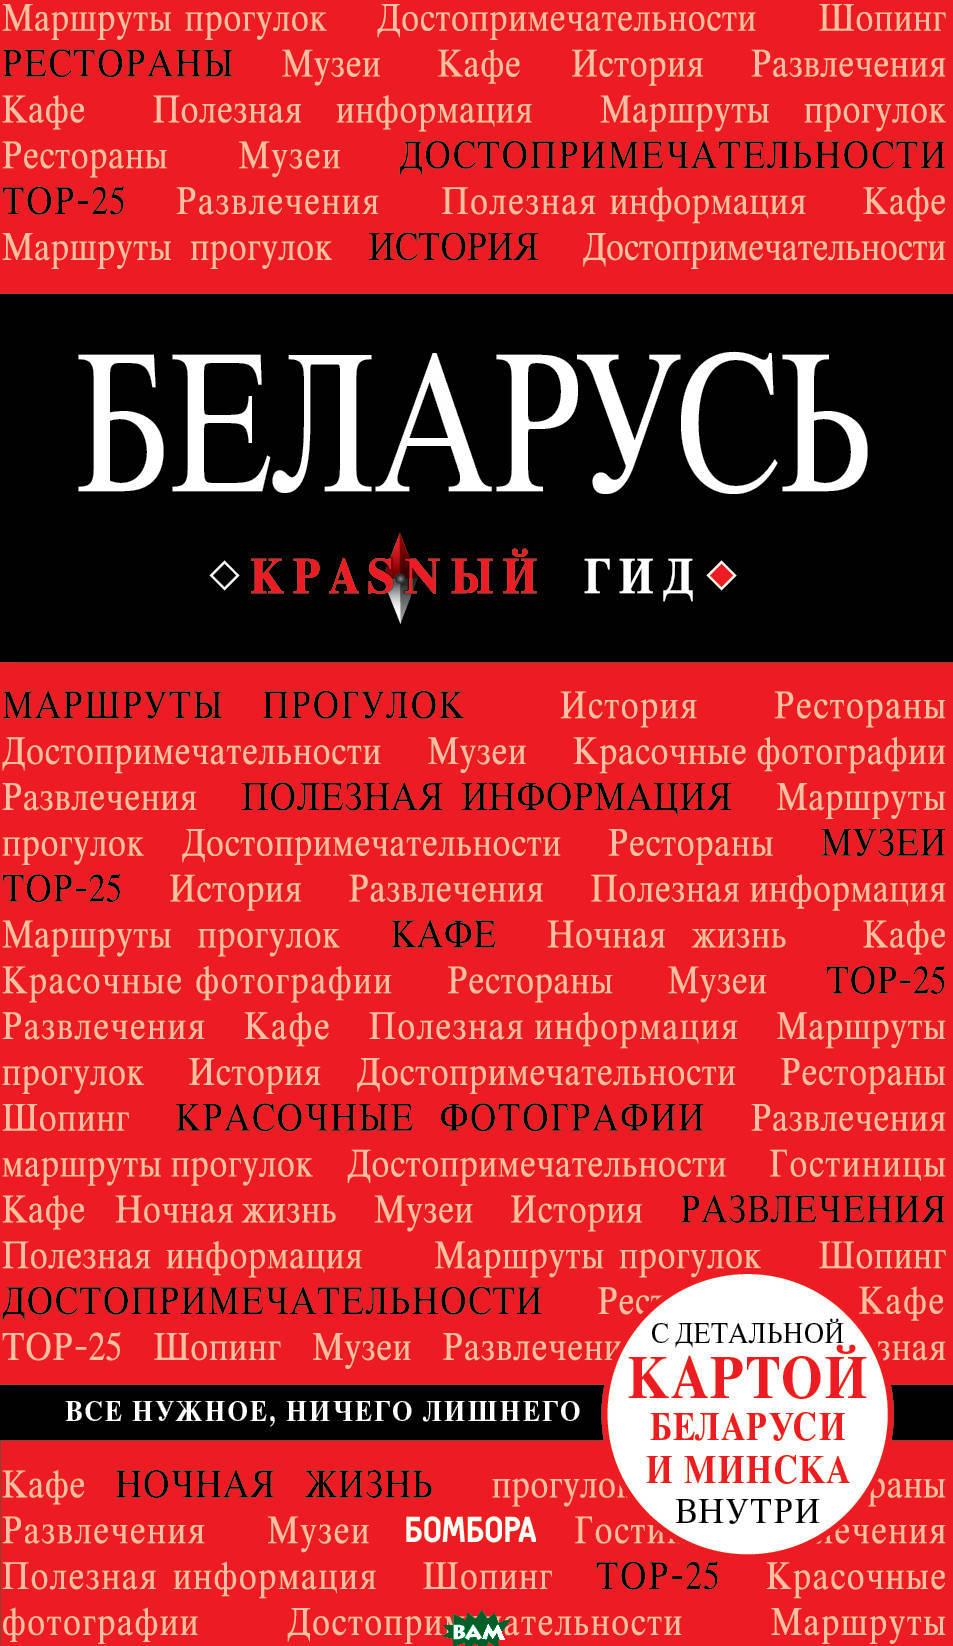 Купить Беларусь. 3-е изд. испр. и доп., Бомбора, Кульков Д.Е., , 978-5-04-096224-2